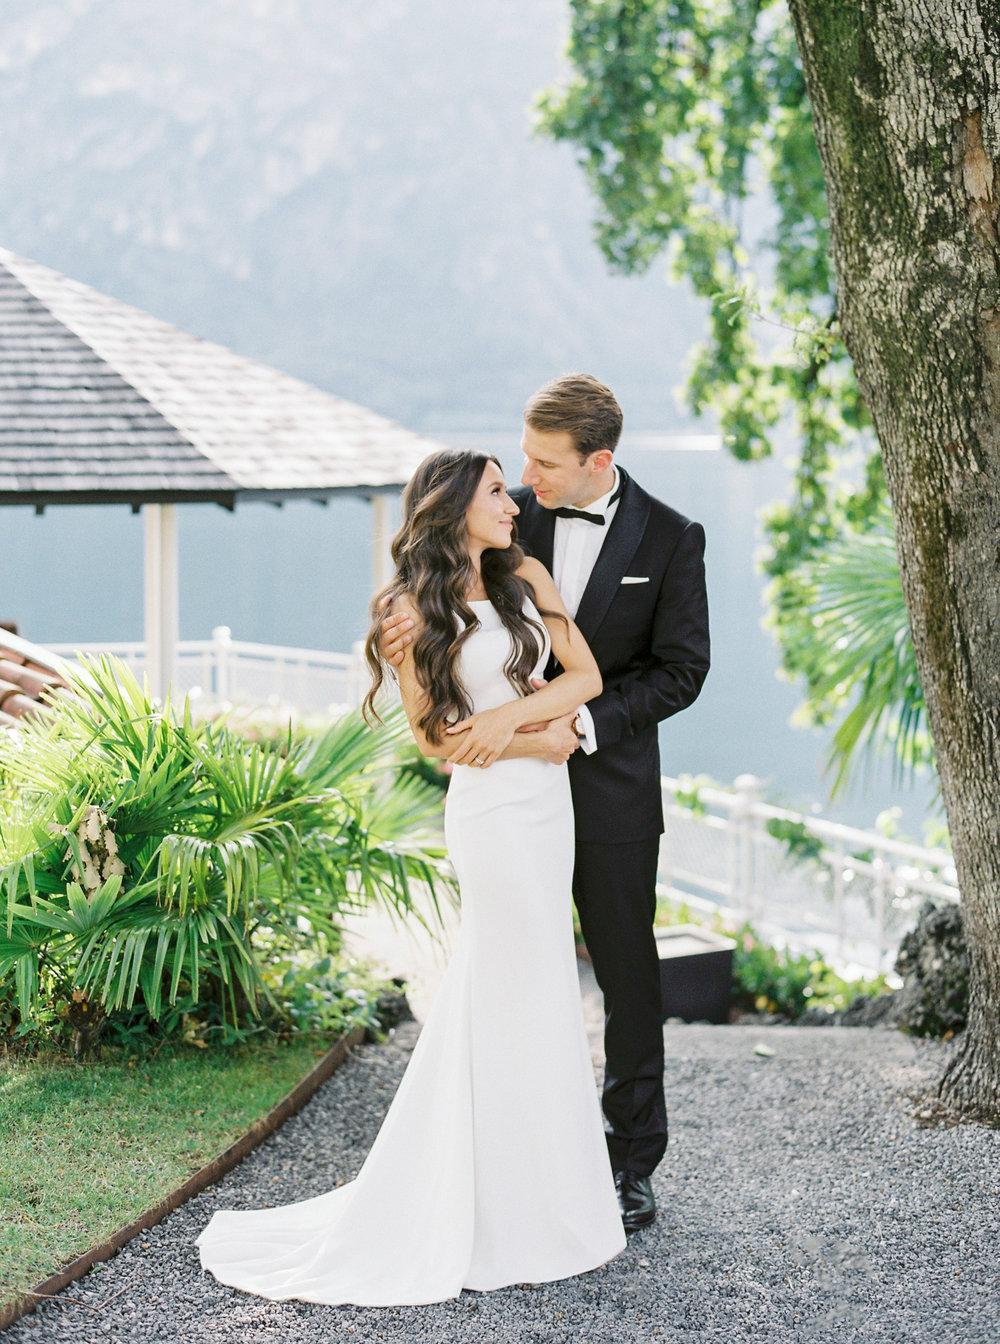 Lake+Como+wedding+by+nastia+vesna.jpeg